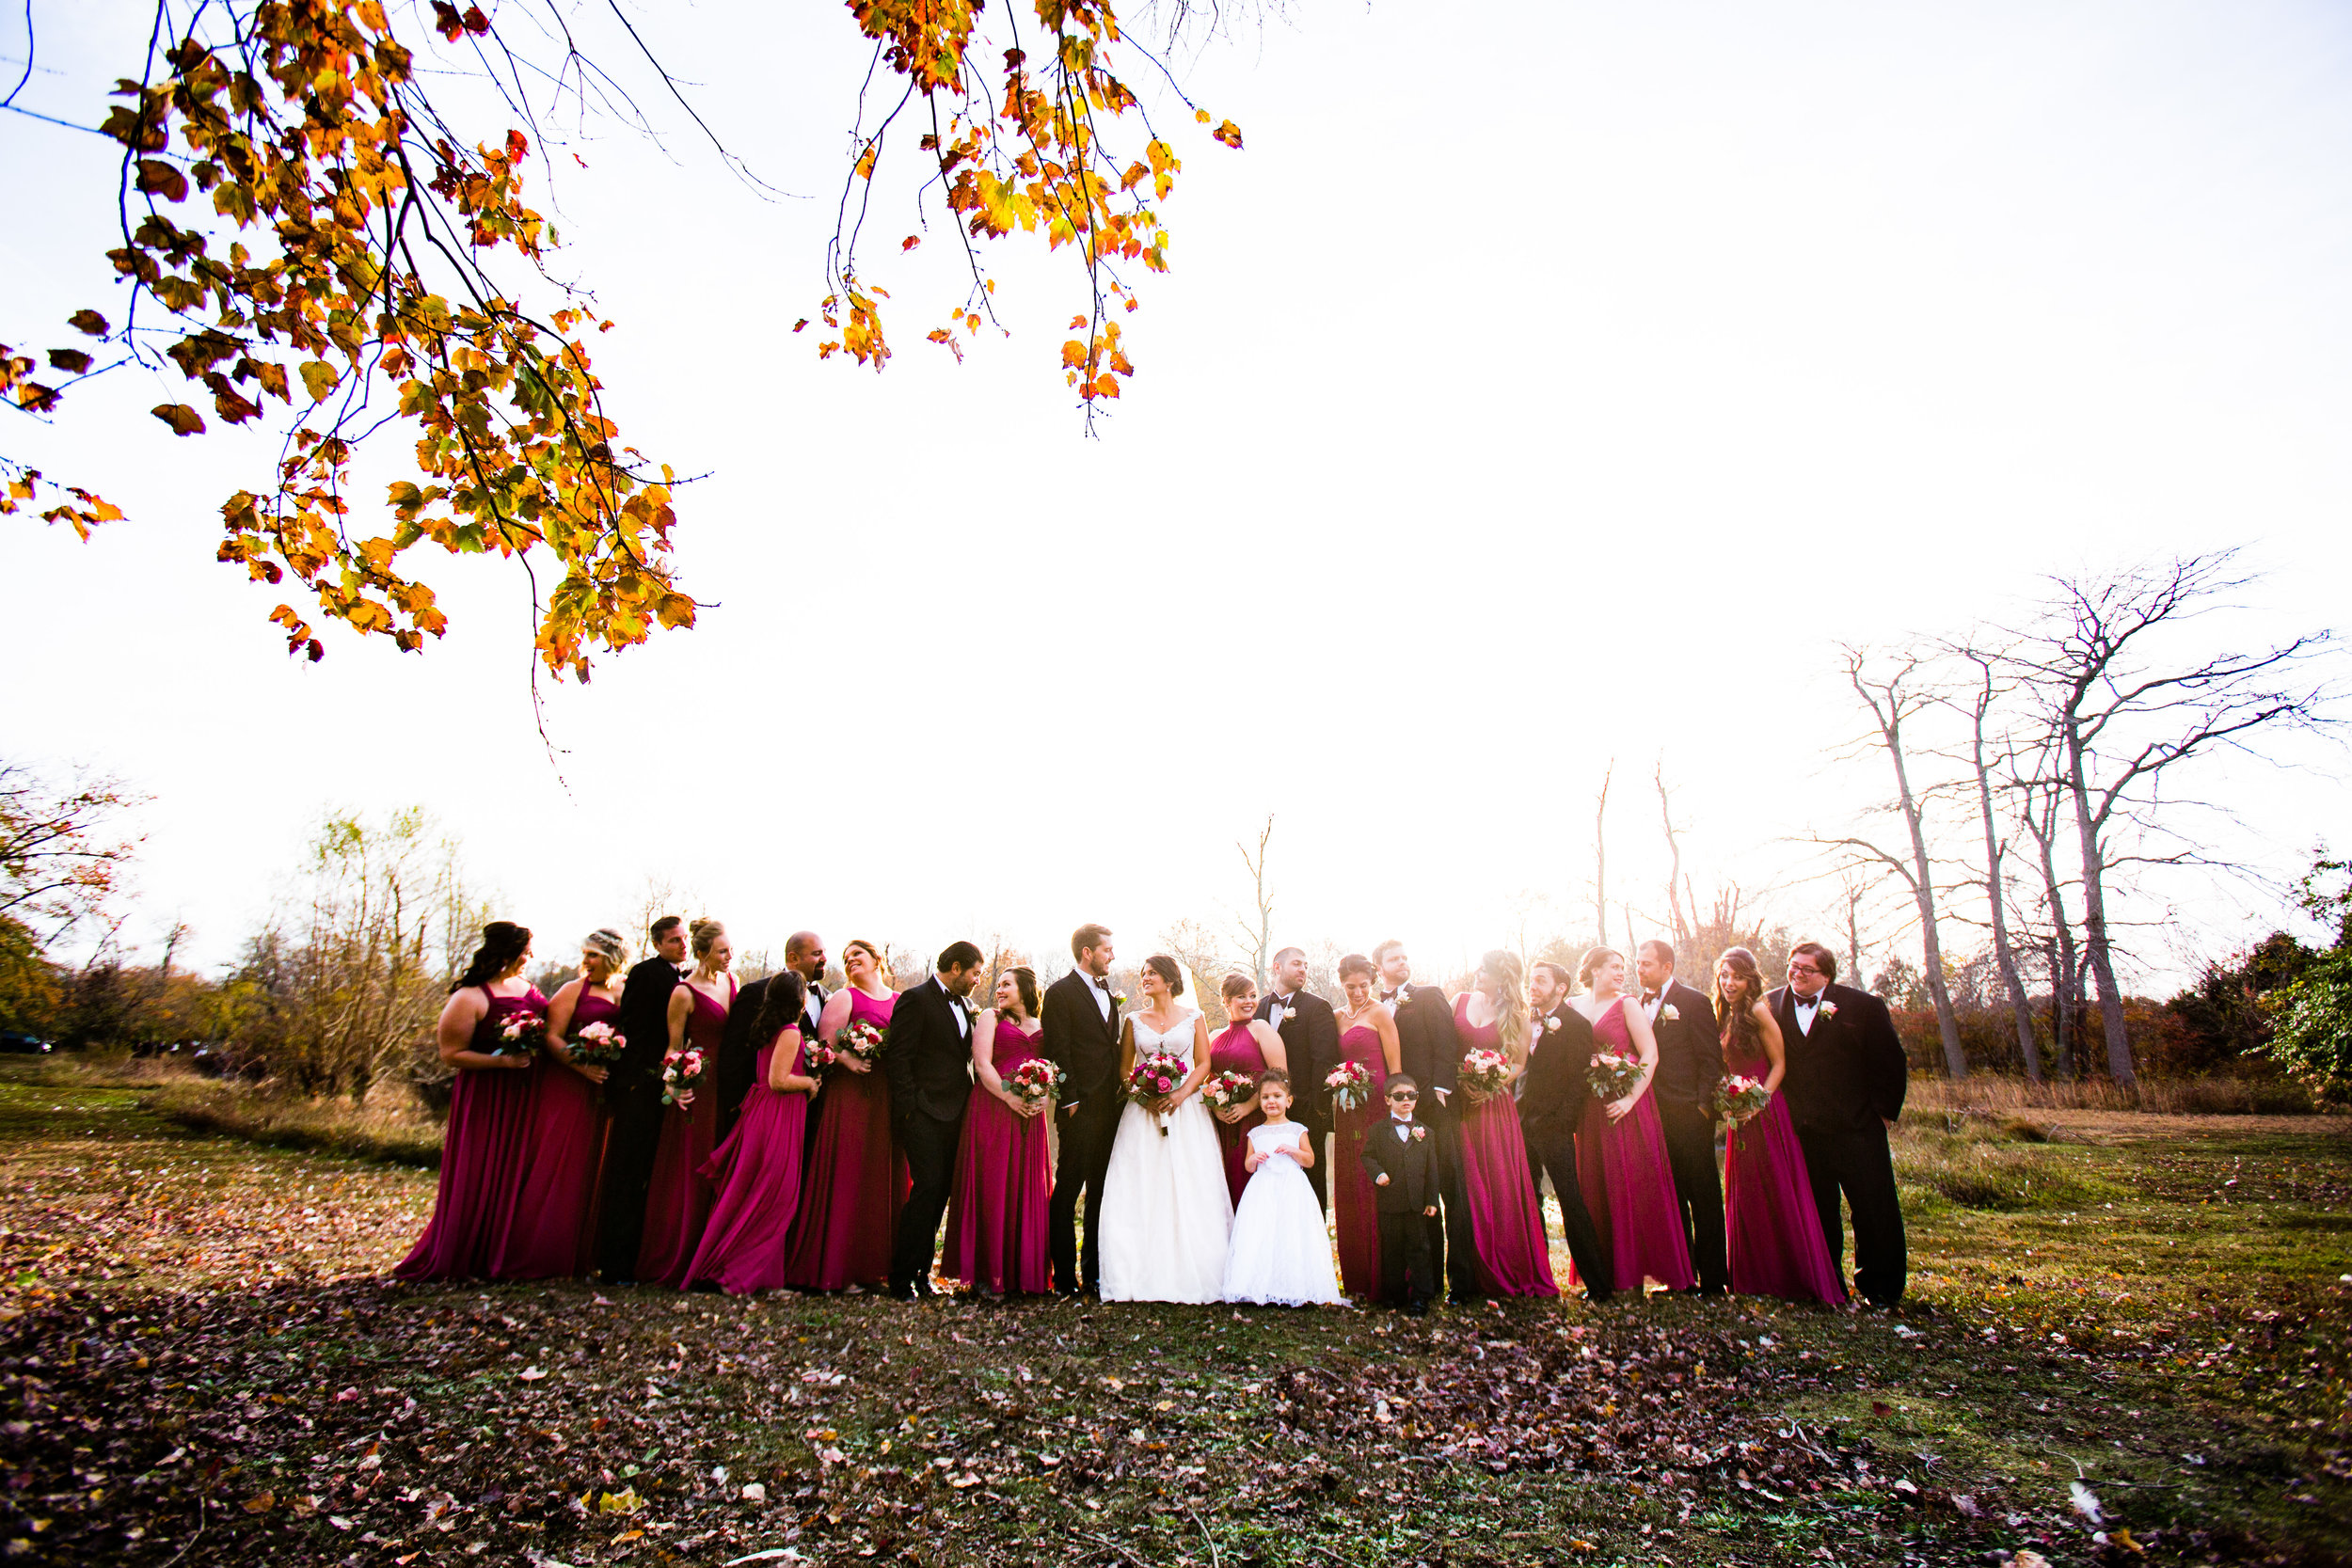 Luciens Manor Wedding Photos - 045.jpg